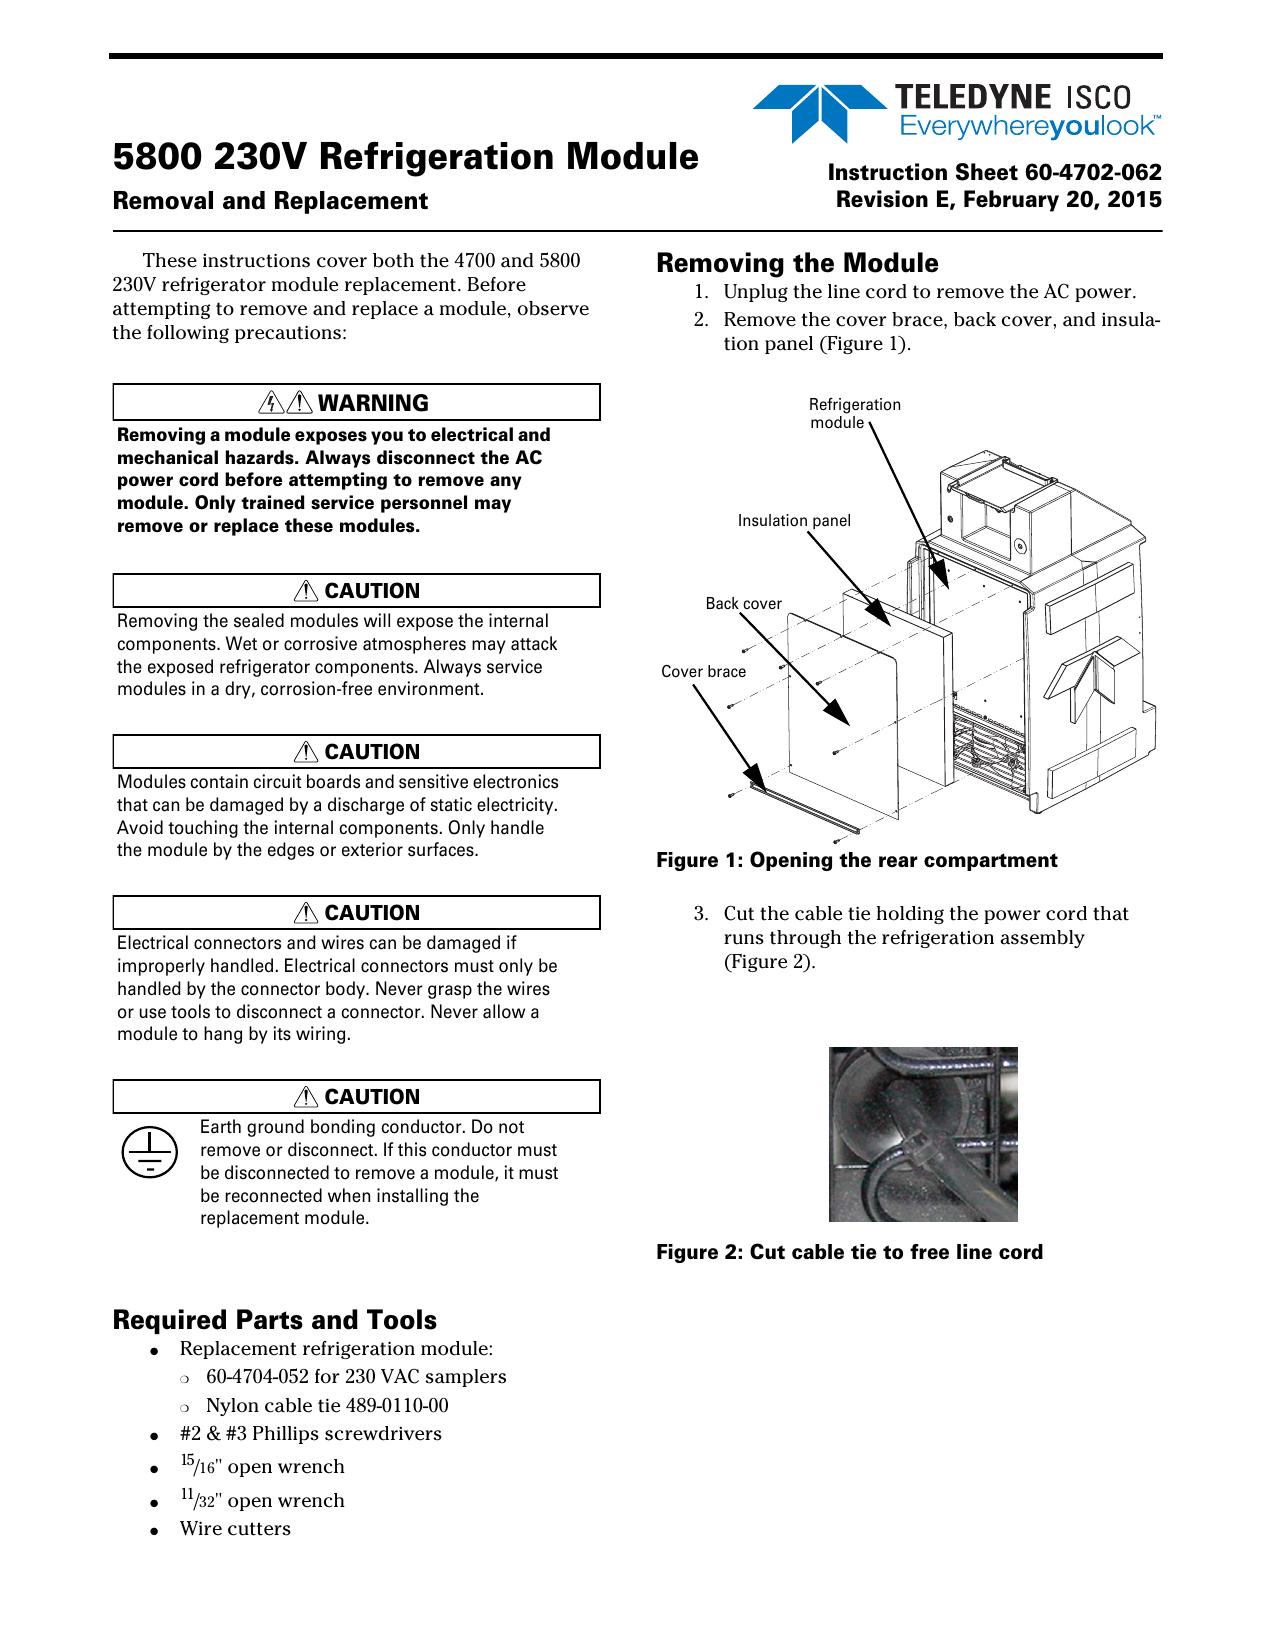 5800 230v Refrigeration Module Wiring